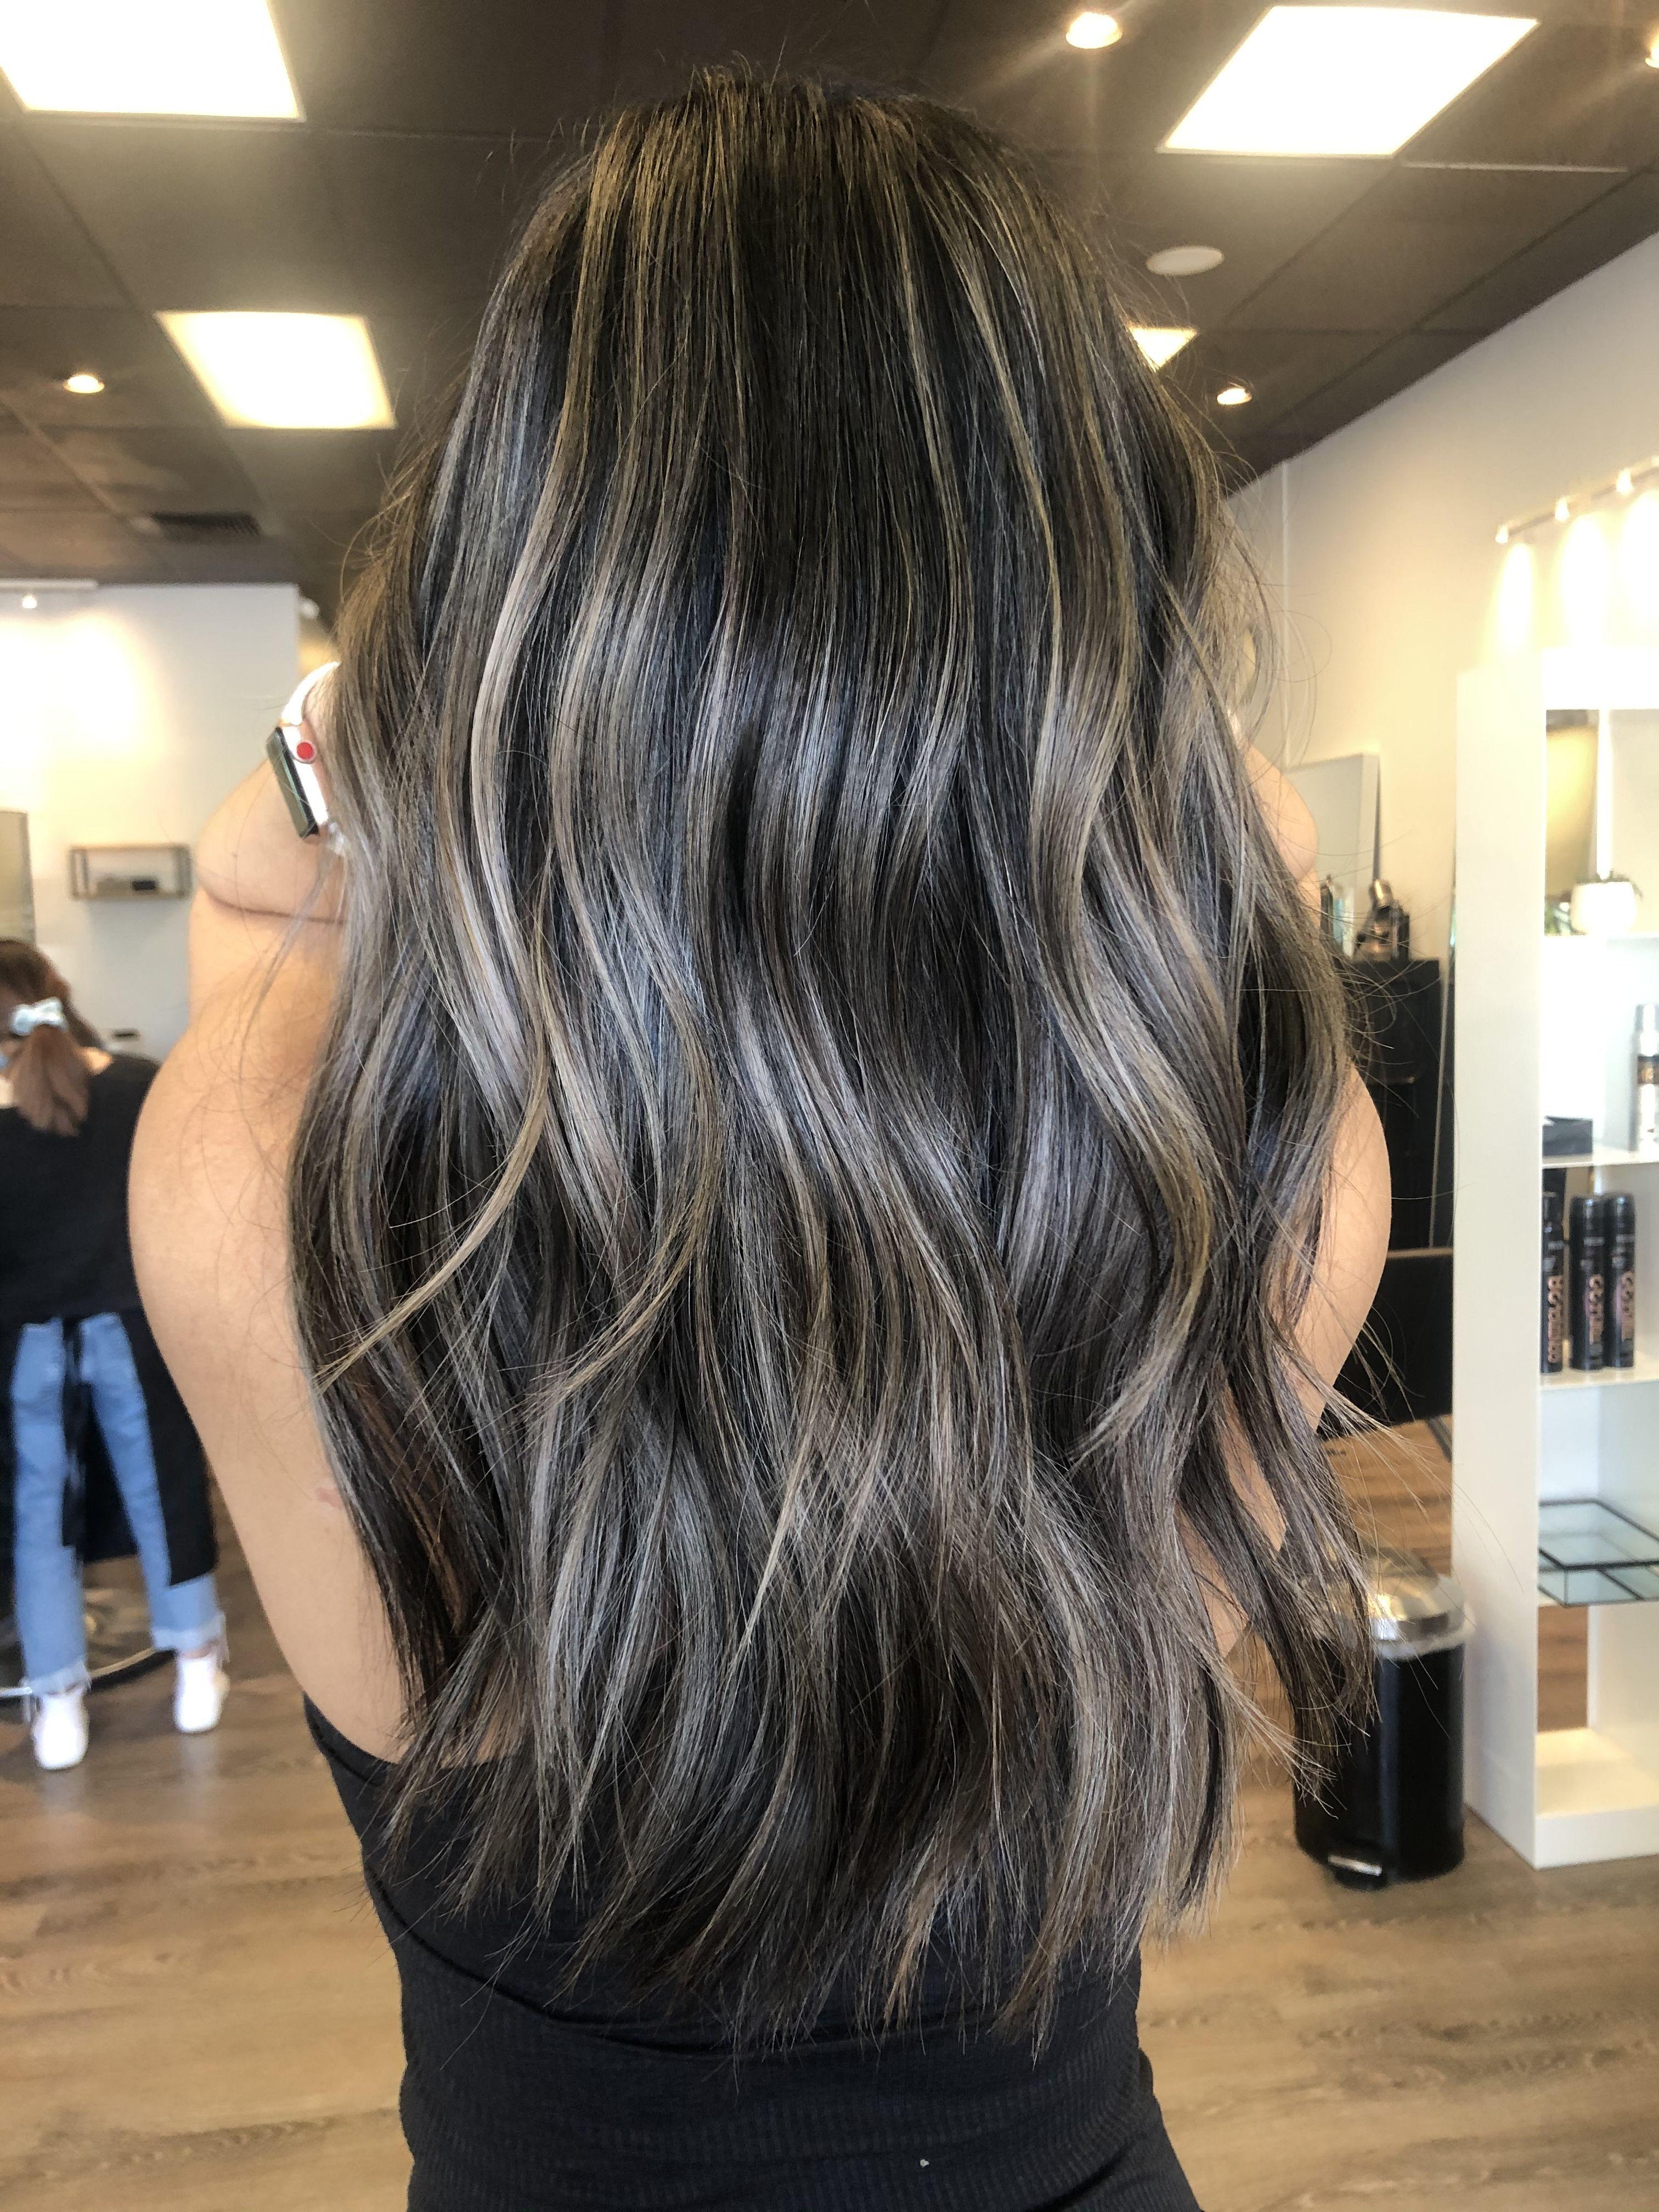 Ash Brown Balayage Hair Color For Black Hair Brown Hair Balayage Ash Brown Hair Balayage